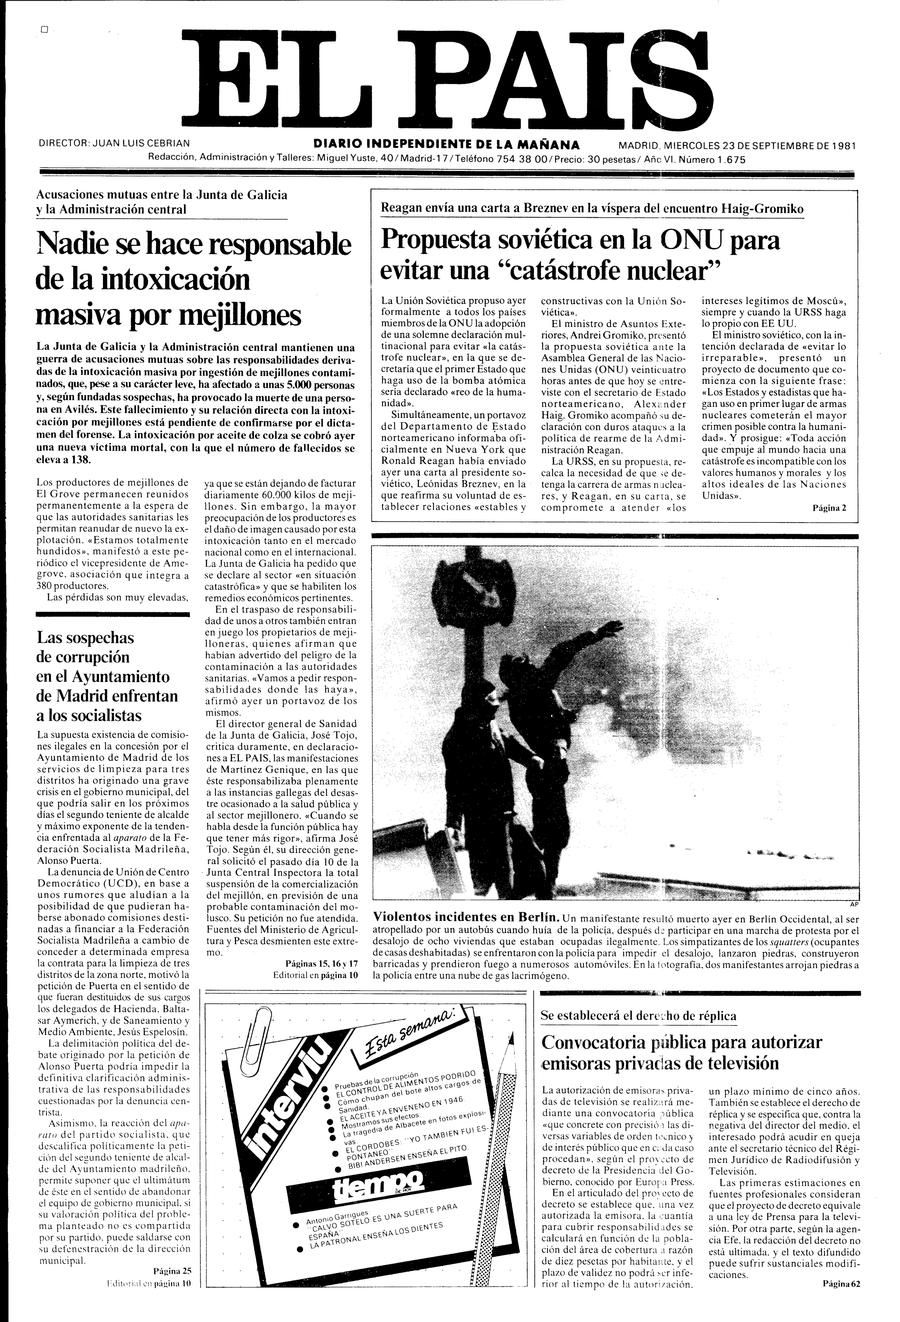 23 de Septiembre | PORTADAS EL PAIS | Pinterest | 23 de septiembre ...